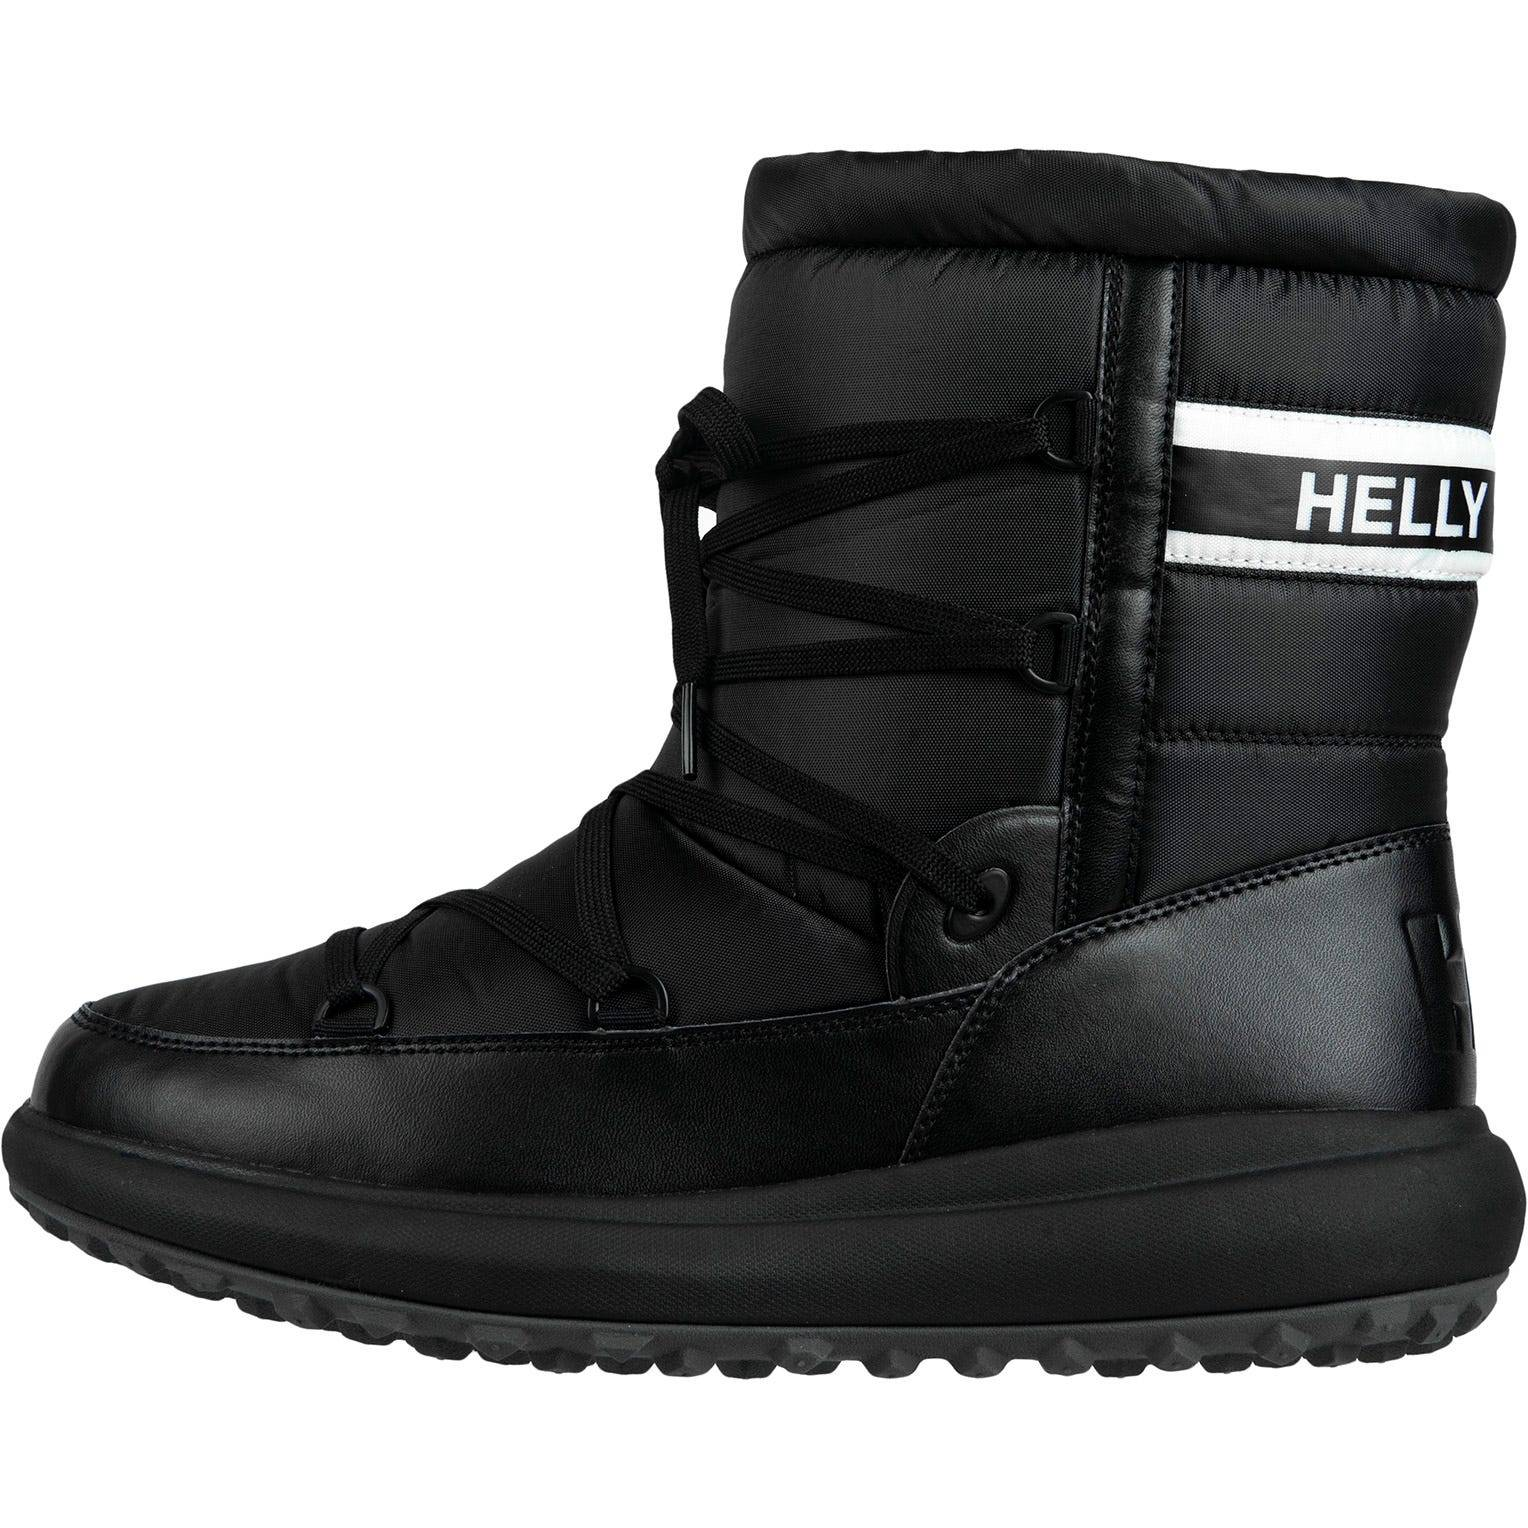 Helly Hansen Isola Court Mens Winter Boot Yellow 48/13